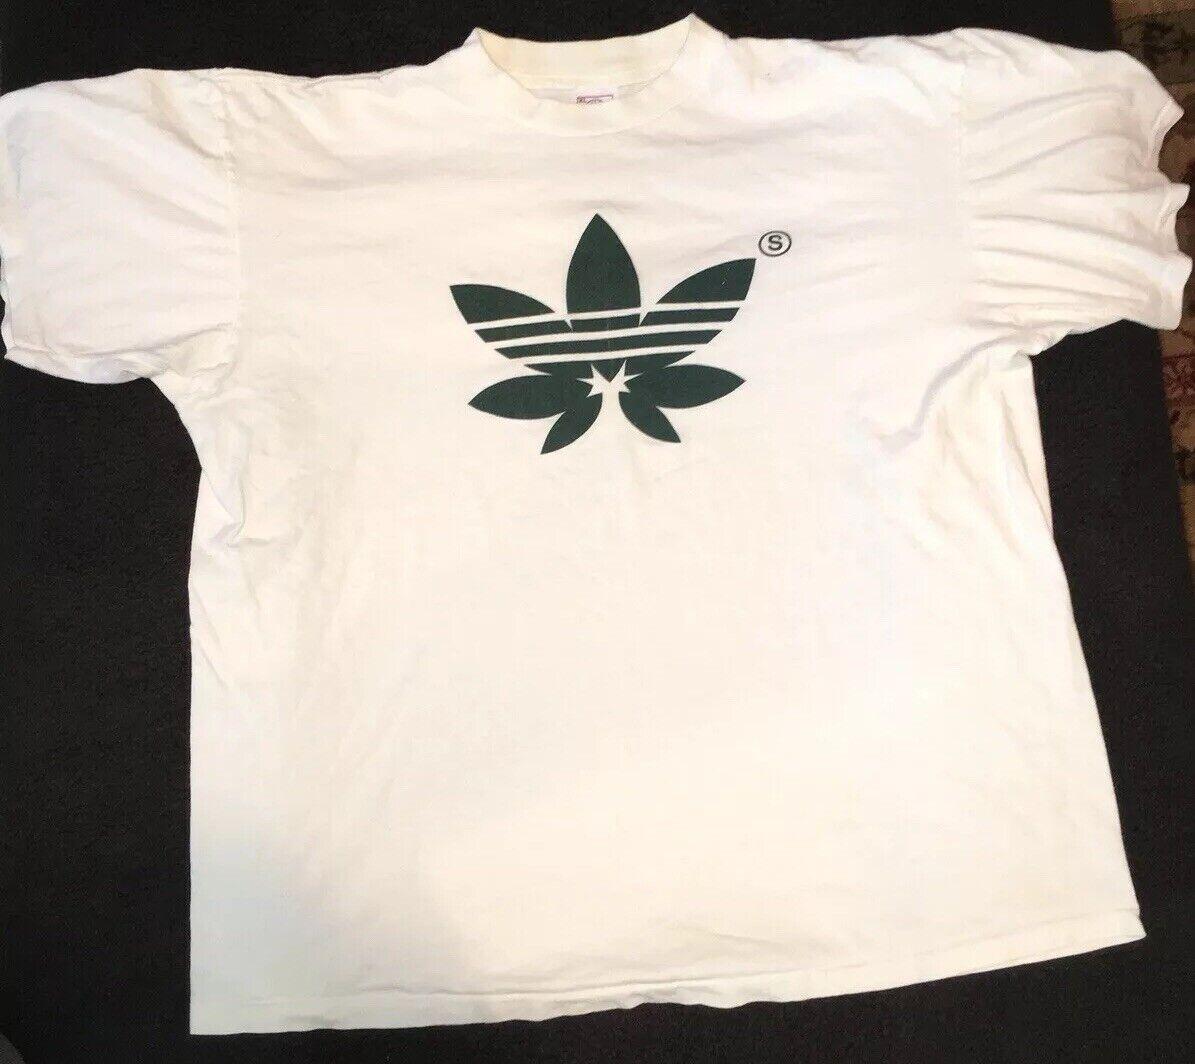 SSUR Adidas Leaf Logo Vintage T Shirt Rare Rap Tee Si… - Gem